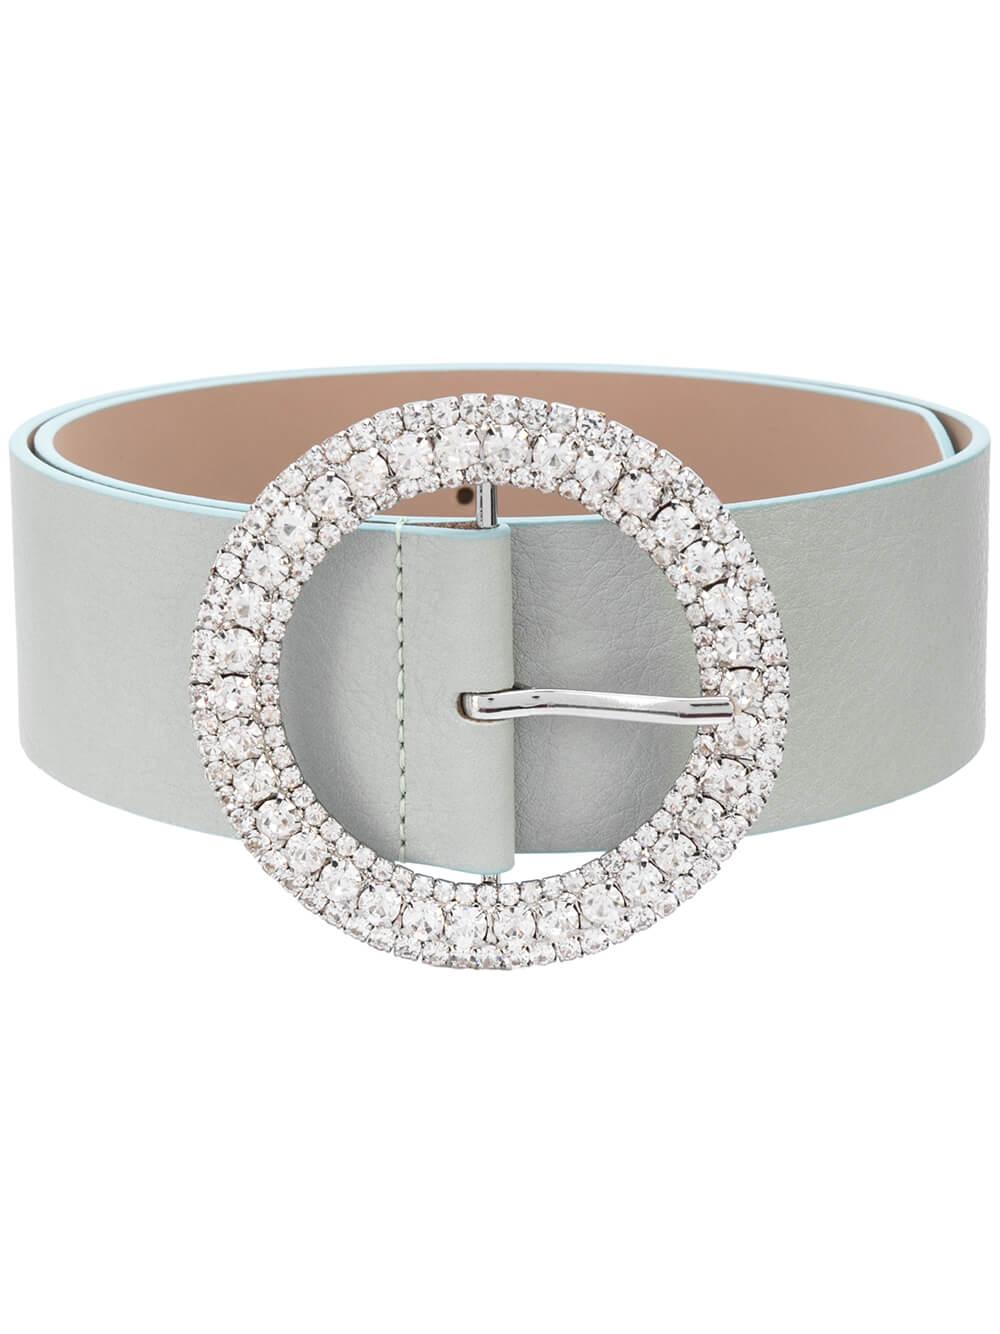 Clara Crystal Round Waist Belt Item # BW497-100LE